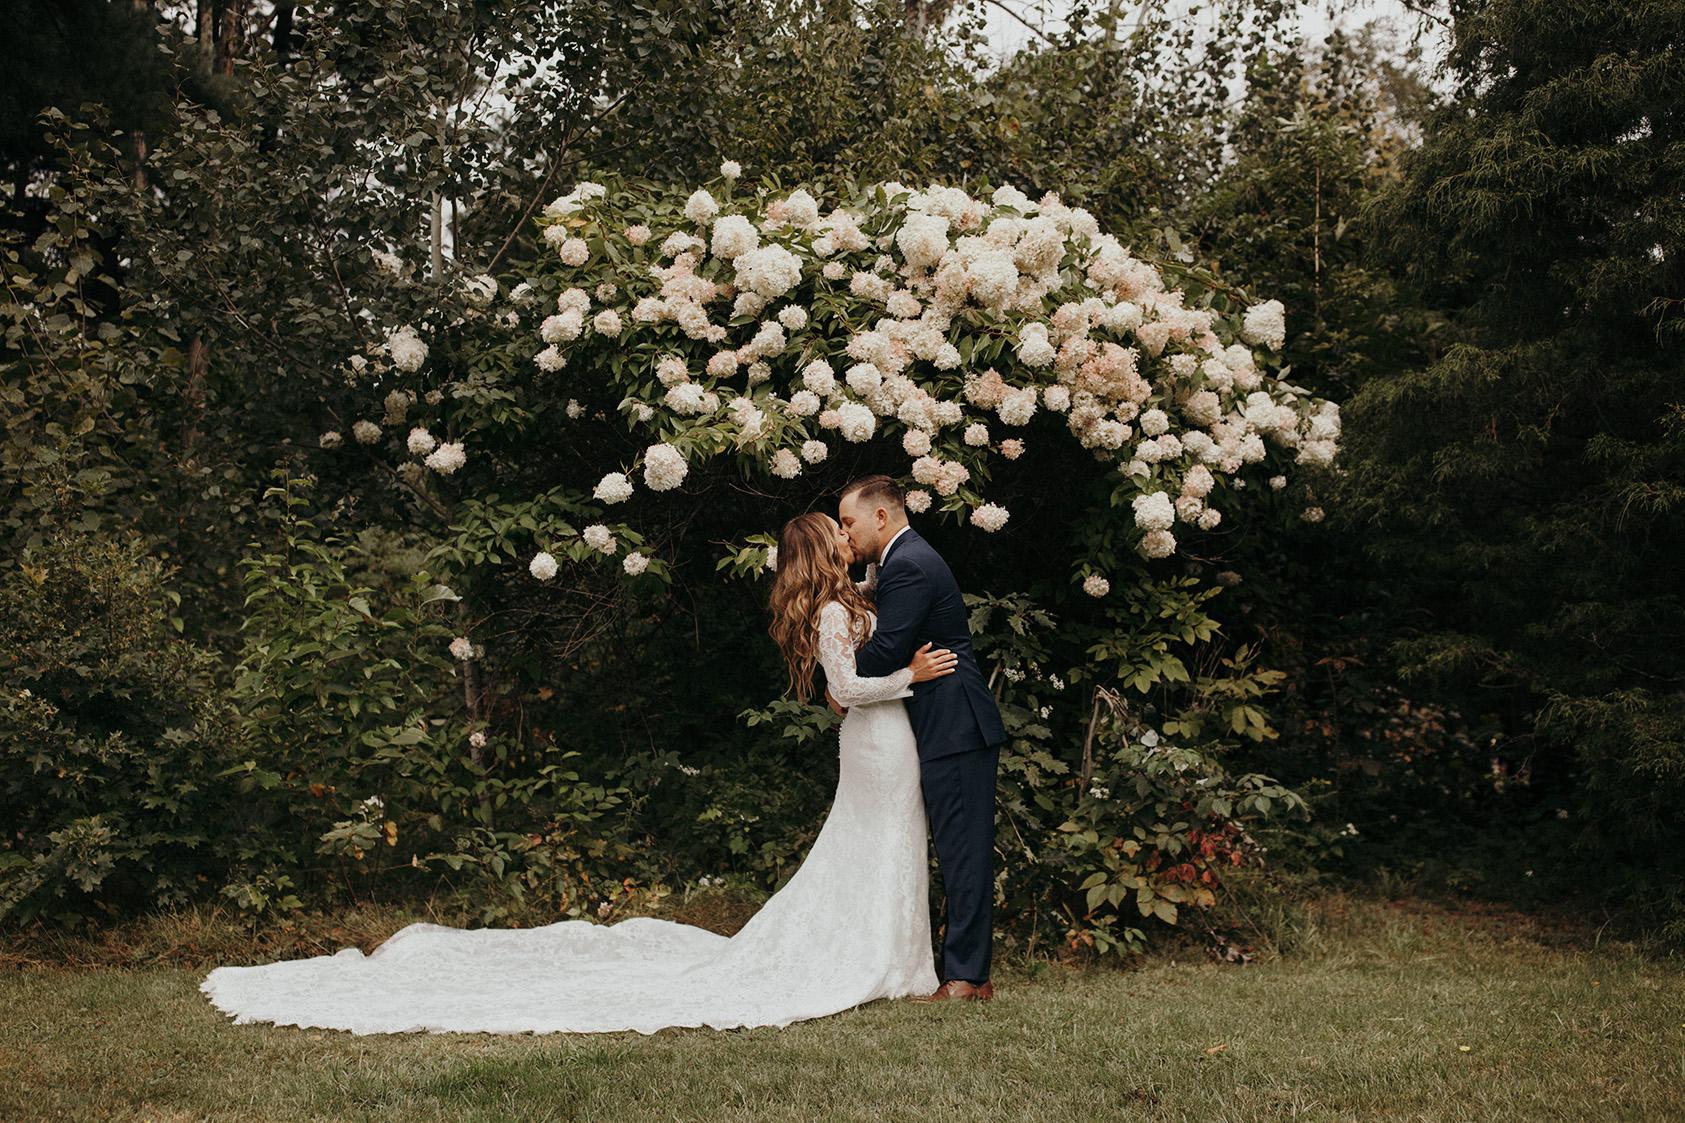 Katelyn and Devin Gambler kissing